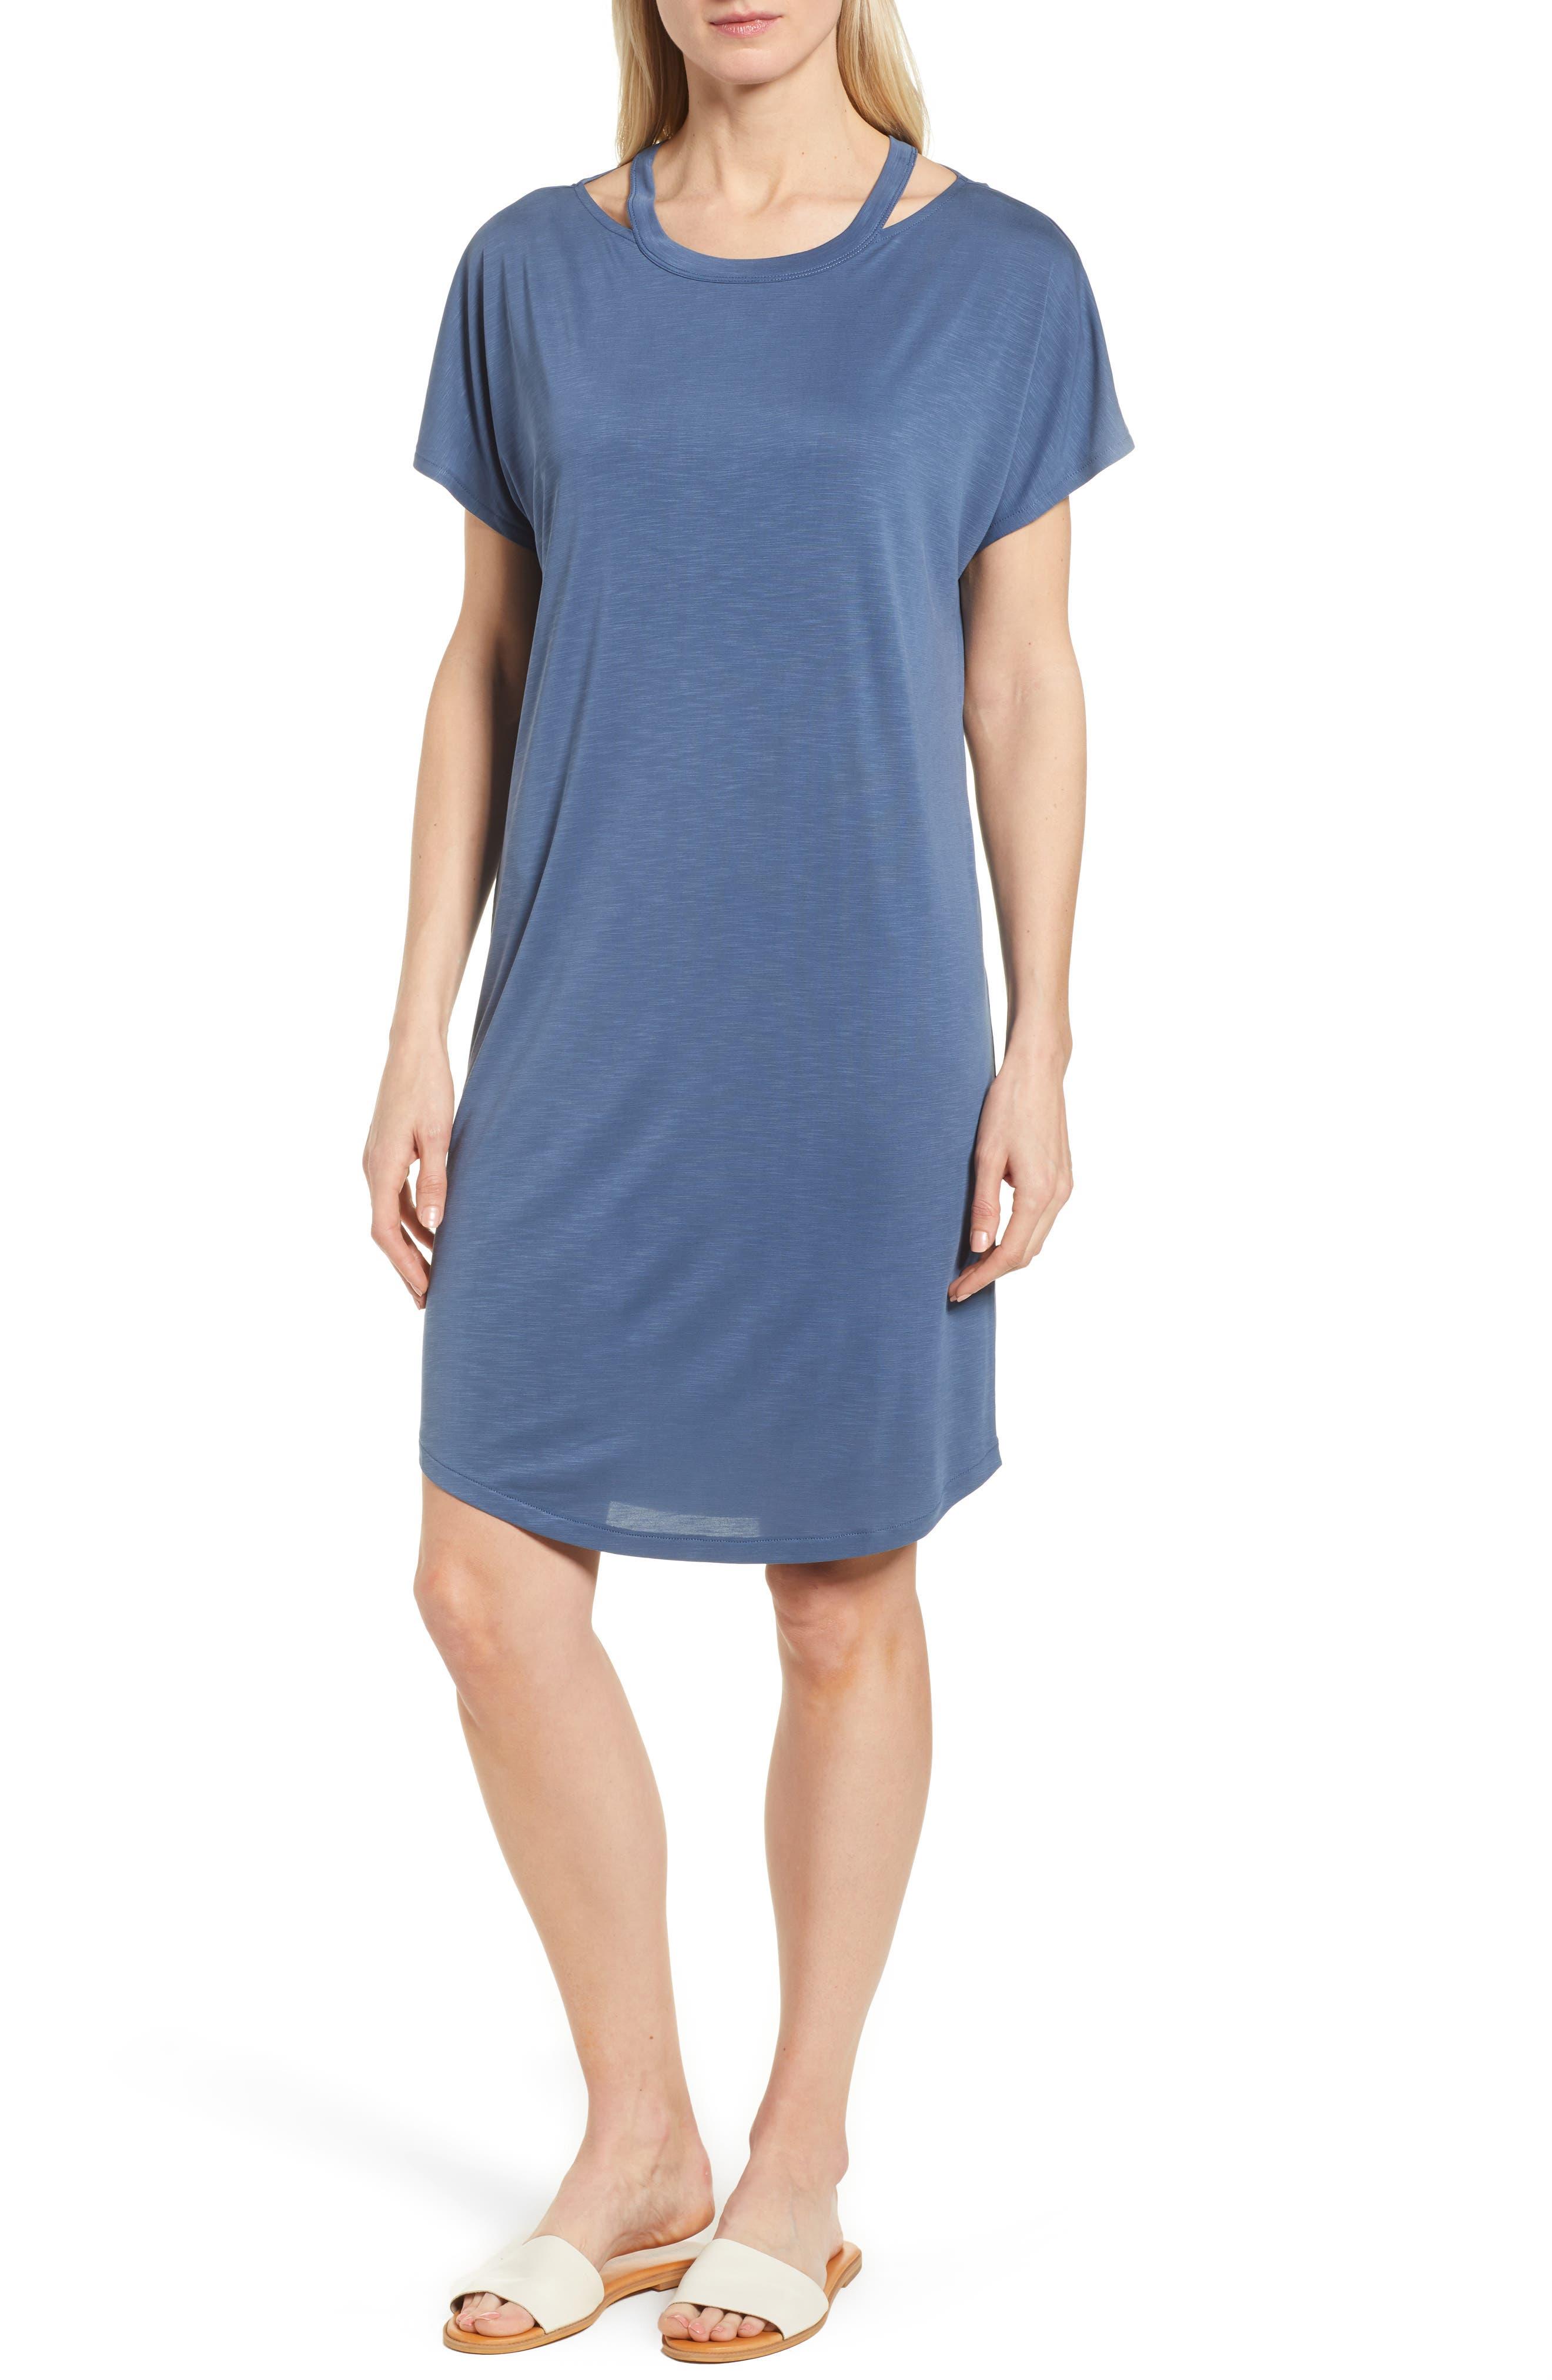 Open Road Dress,                             Main thumbnail 1, color,                             490